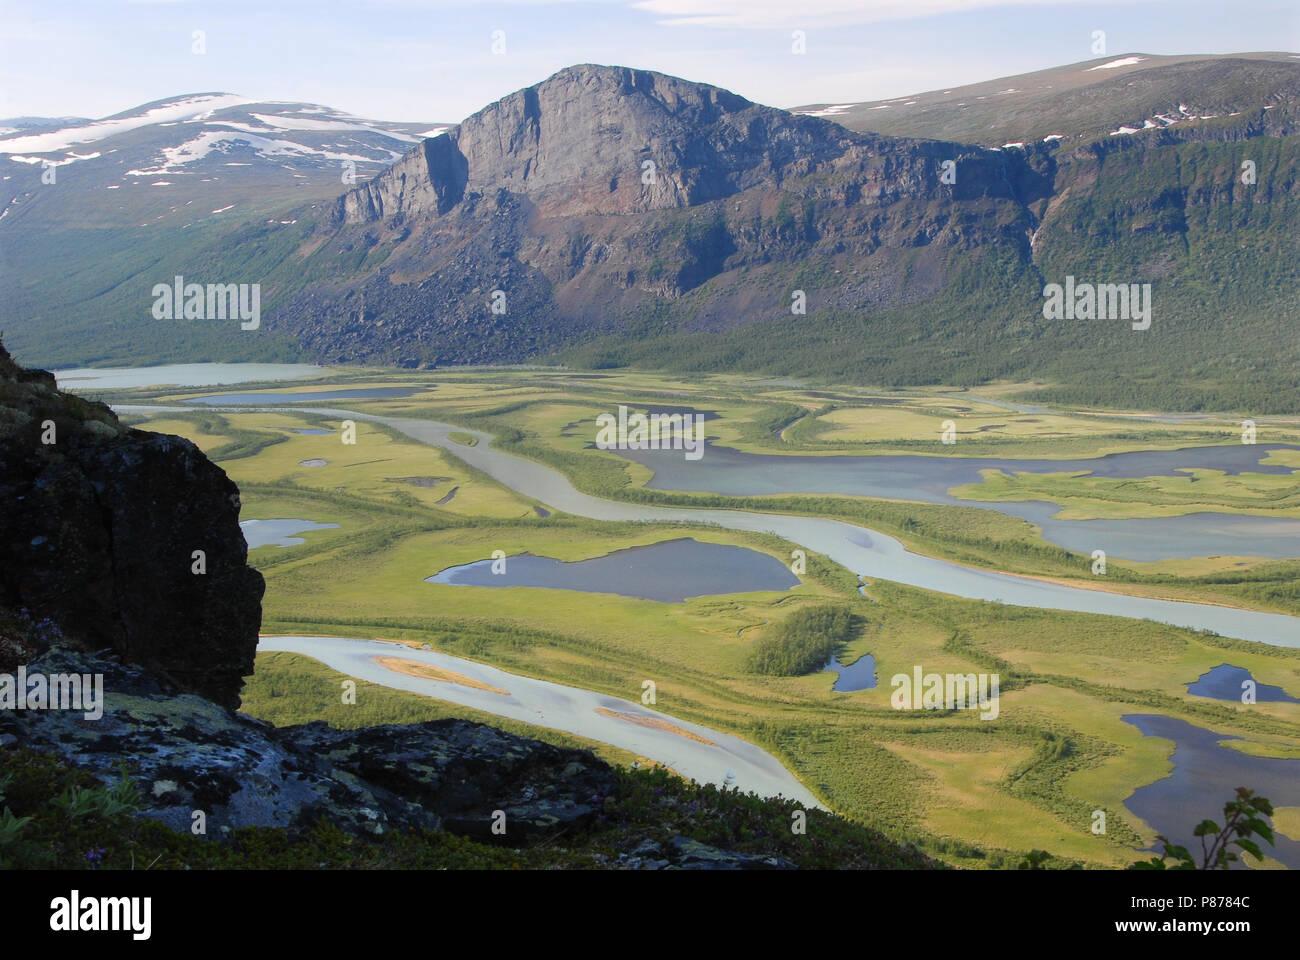 The Beauty of Northern Sweden - Rapaätno delta. Sarek, Northern Sweden. Stock Photo